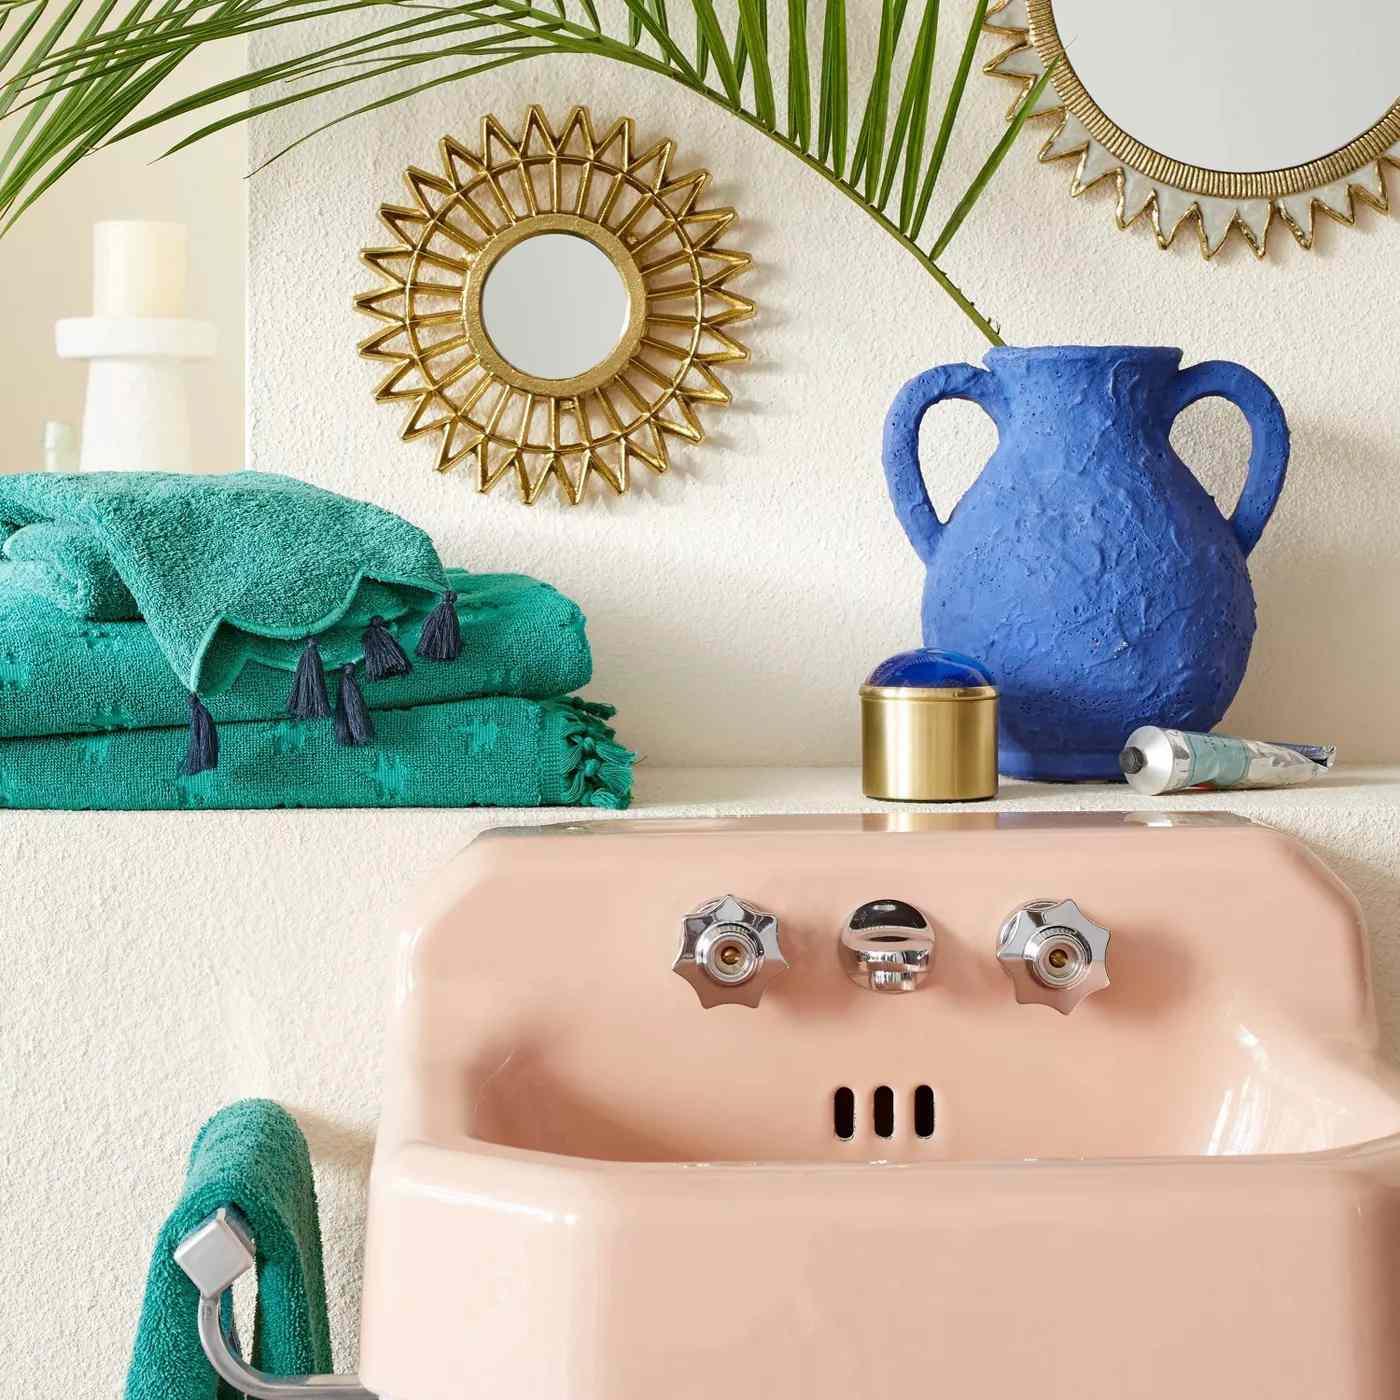 Jacquard Bath Towel with Fringe atop sink.